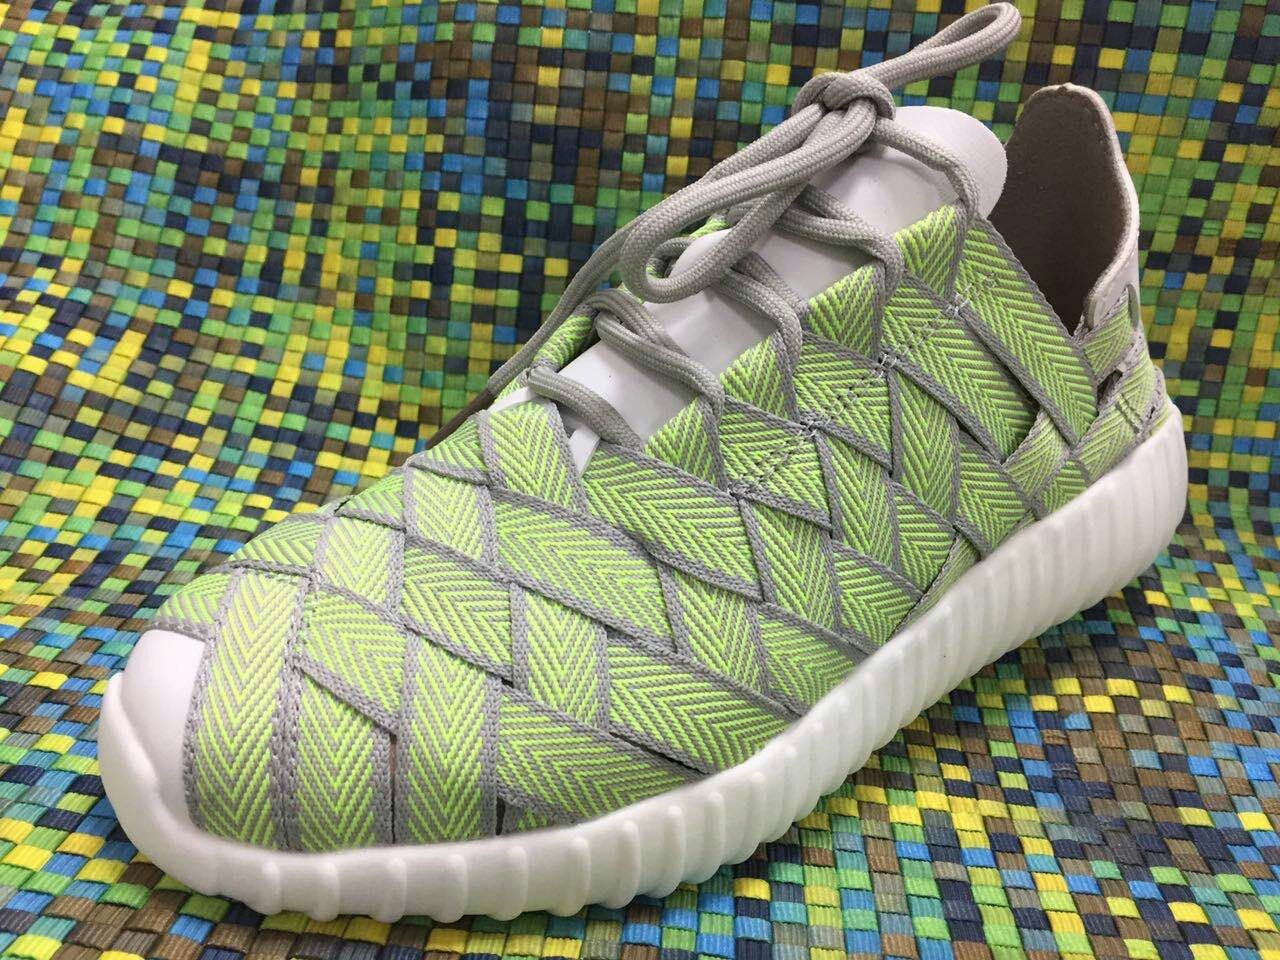 New Design Shoe of Woven Hot Sales Men and Women Shoe